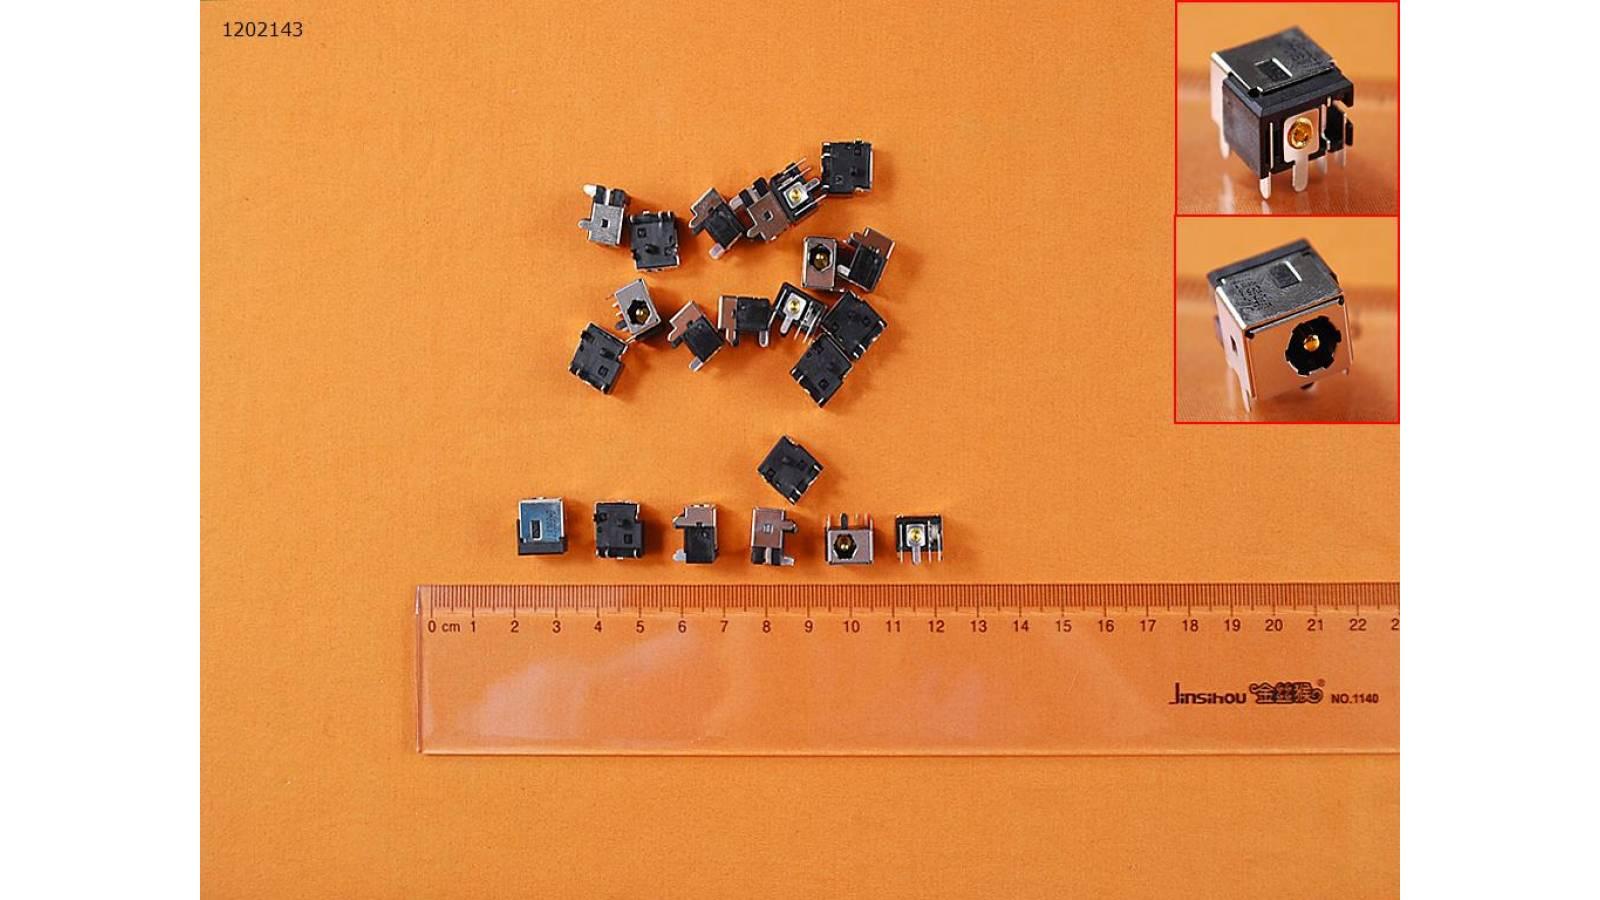 DC JACK POWER HP COMPAQ 610 615 620 625 SERIES